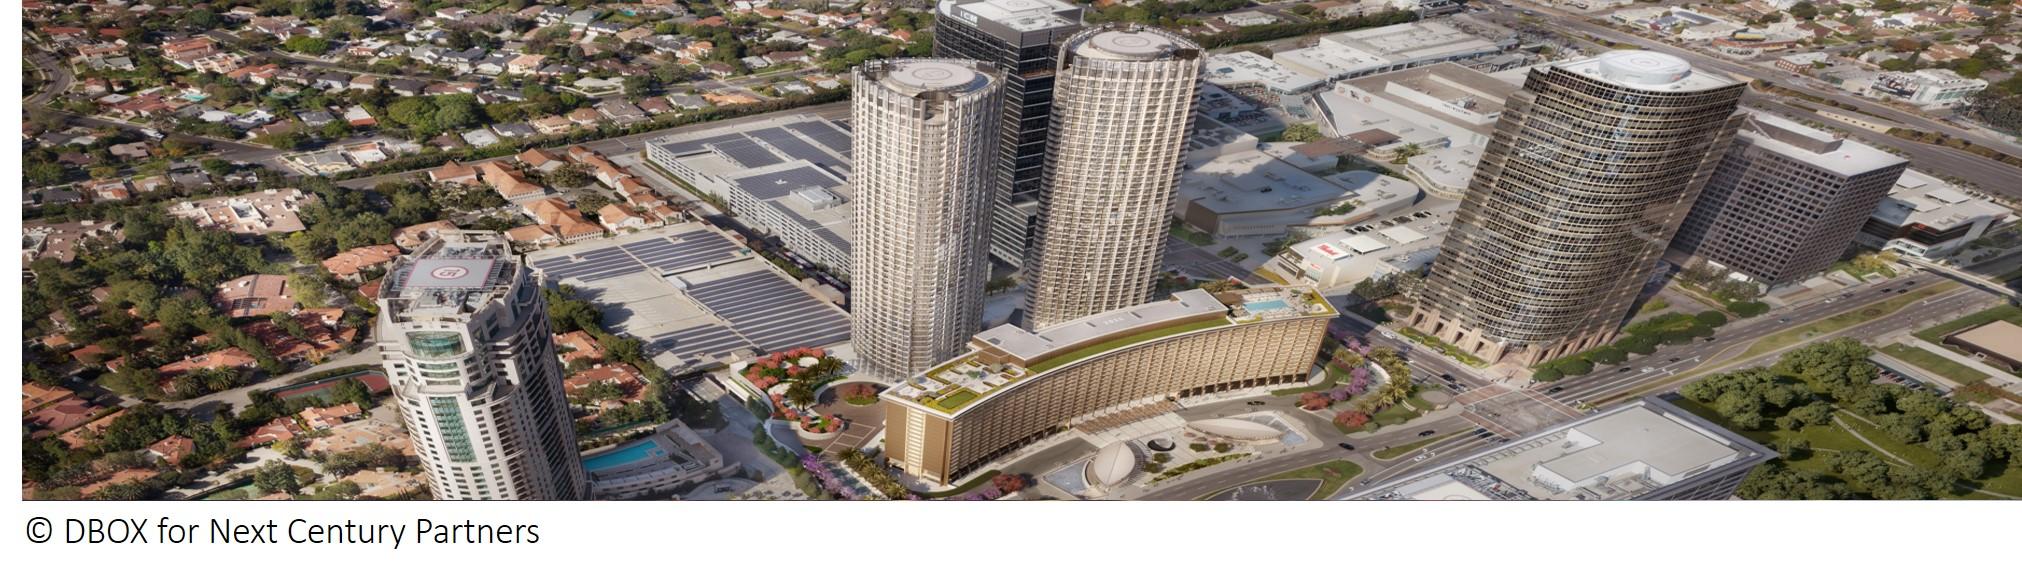 Hyatt Regency Century Plaza Hotel - Environmental Compliance